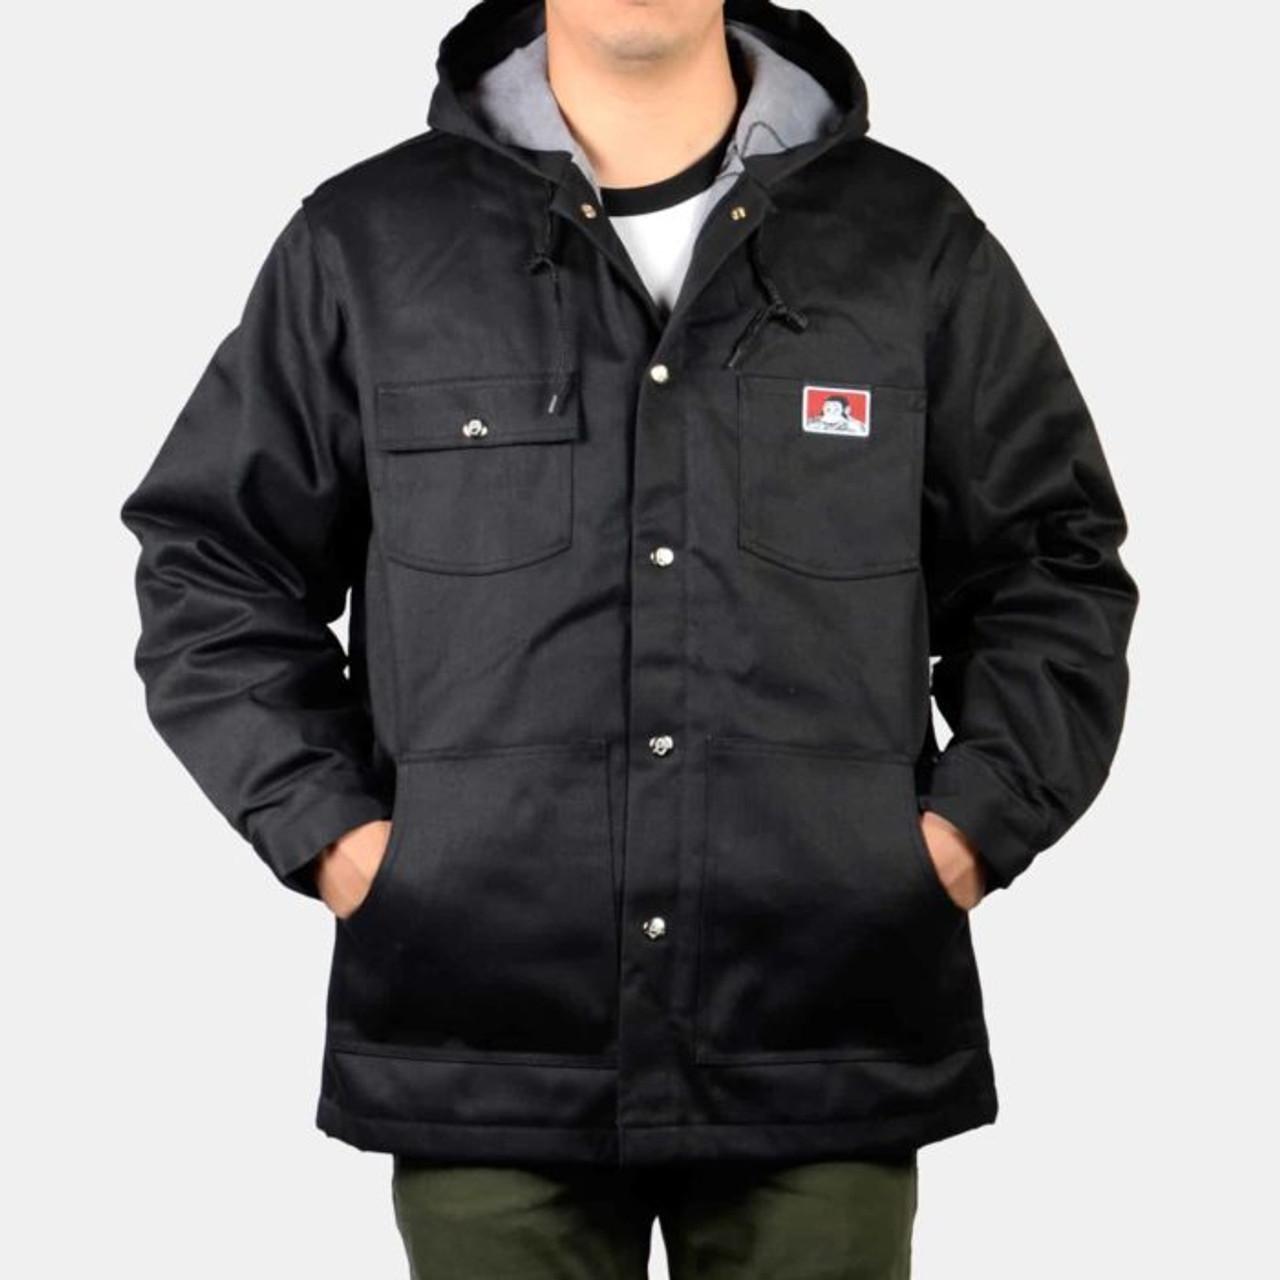 Ben Davis® Hooded Jacket Front Snap